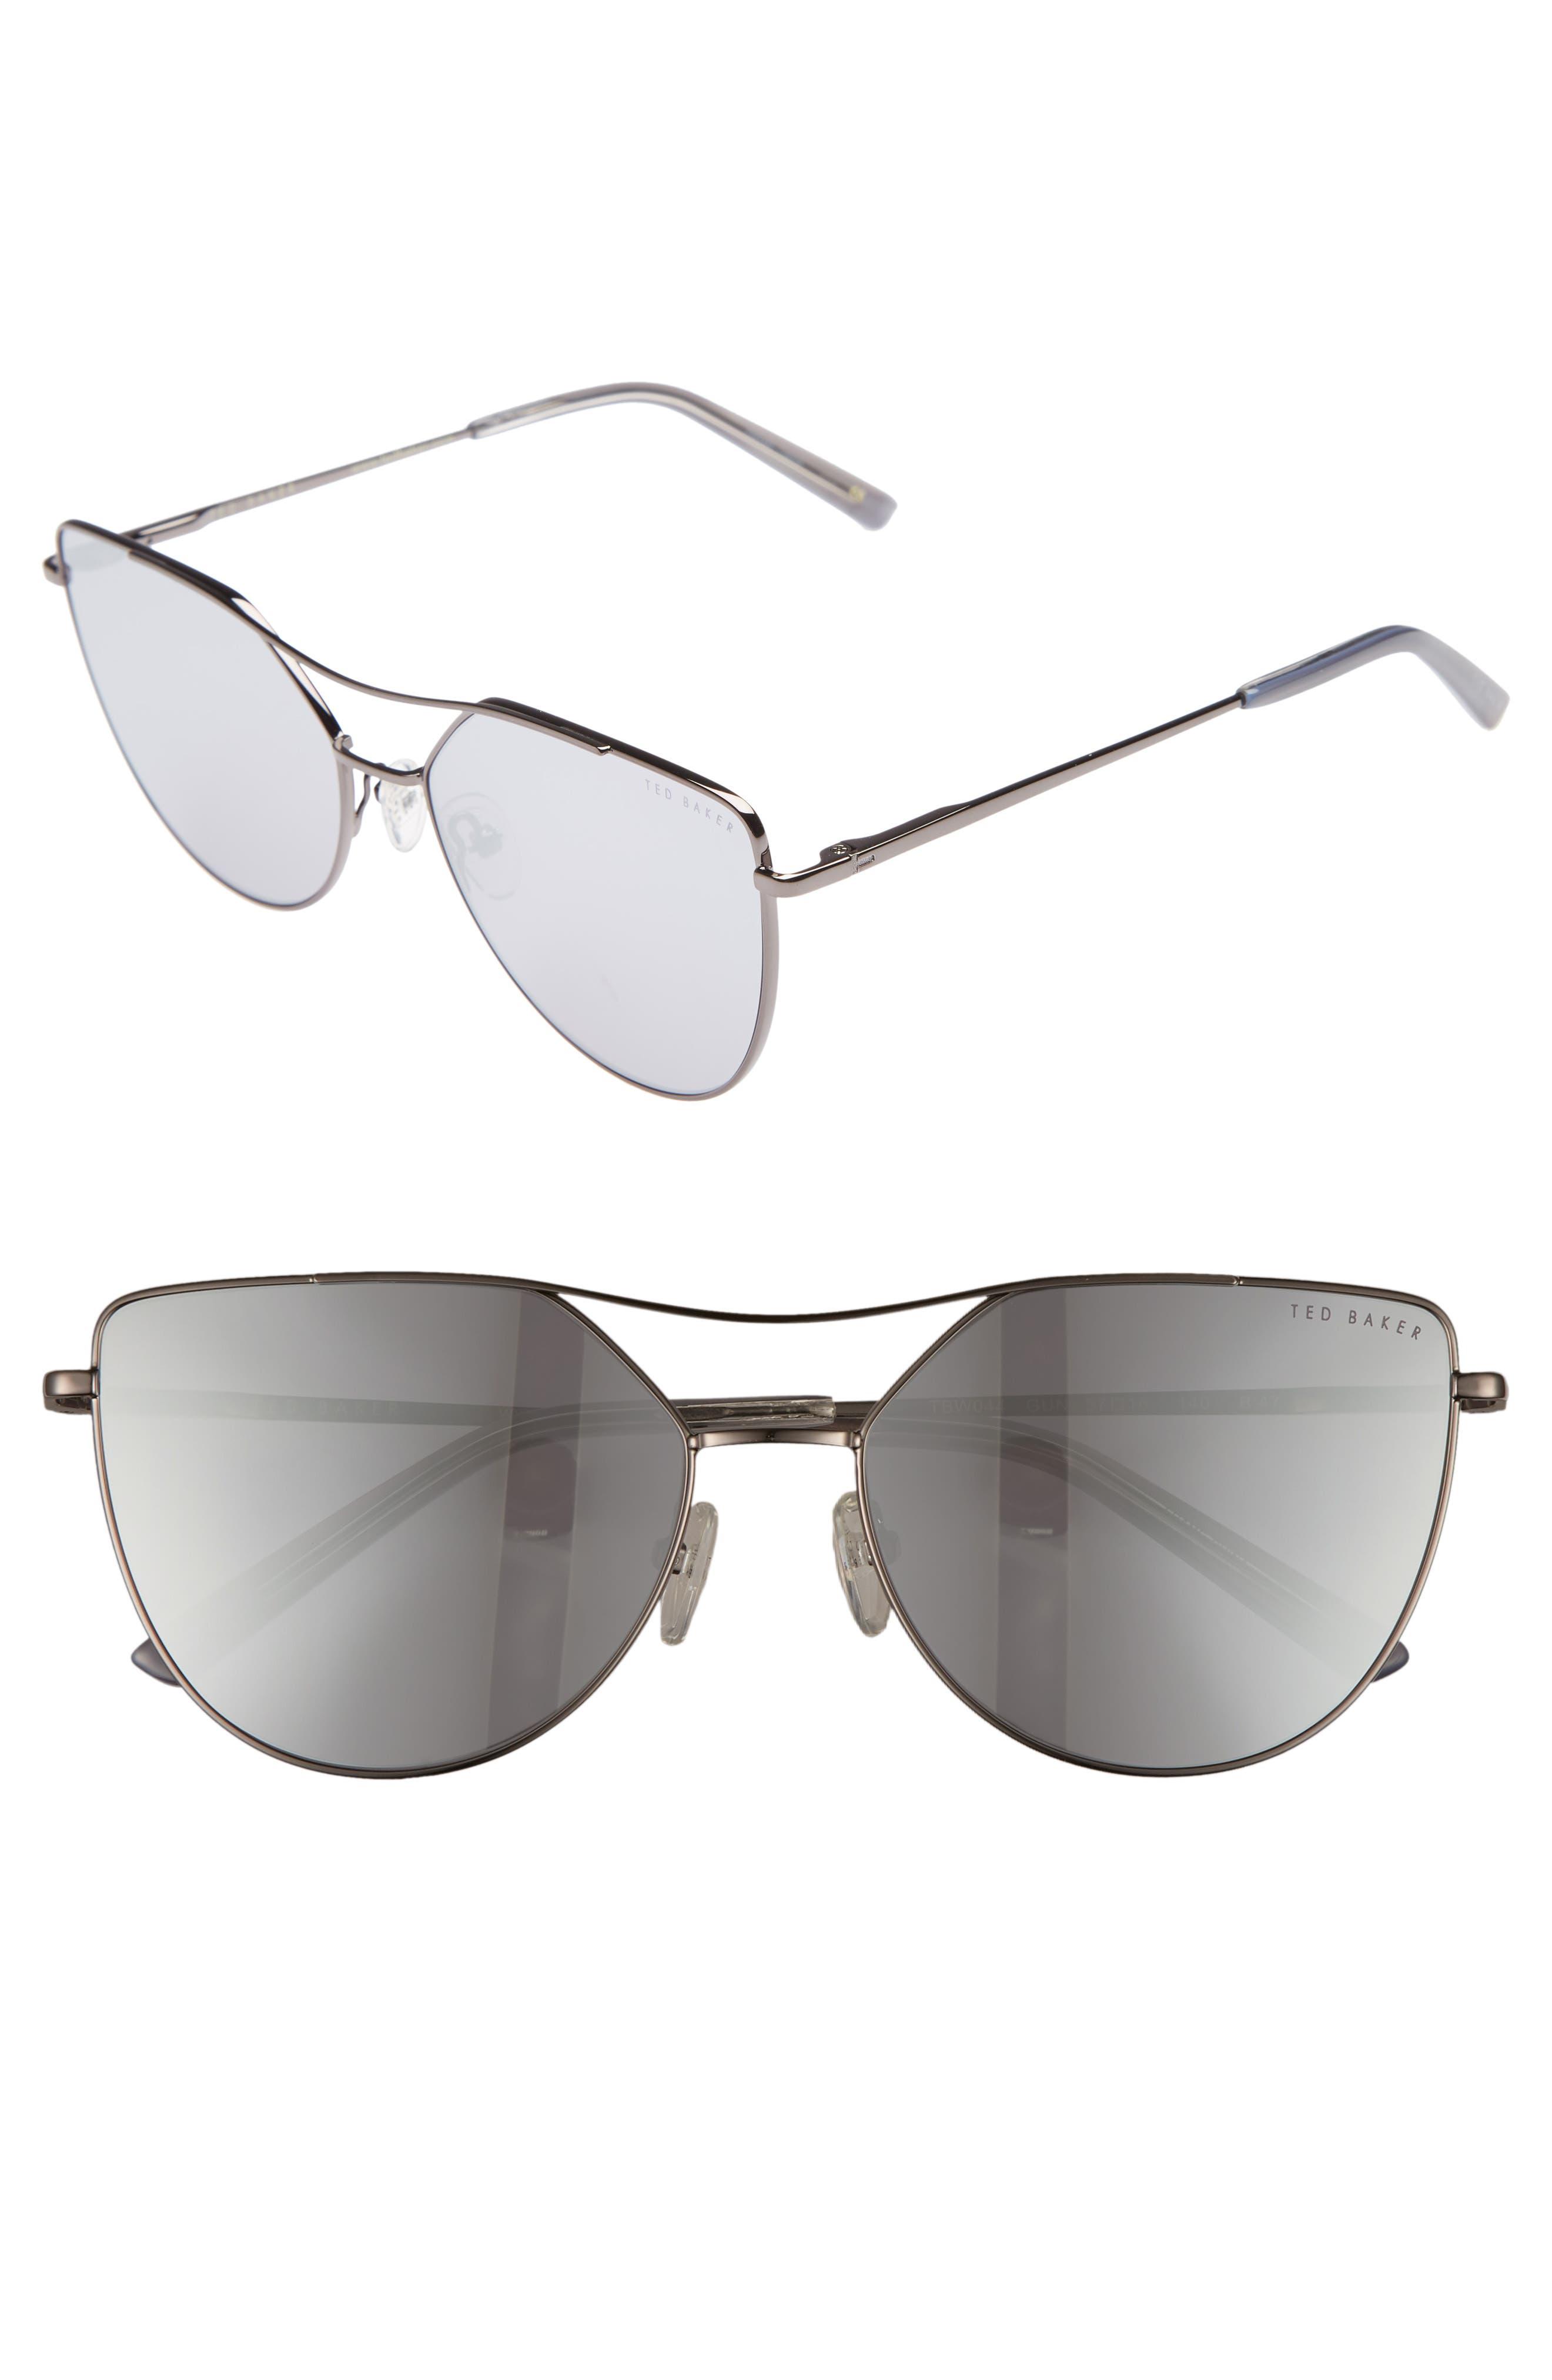 57mm Geometric Aviator Sunglasses,                             Main thumbnail 1, color,                             GUN METAL